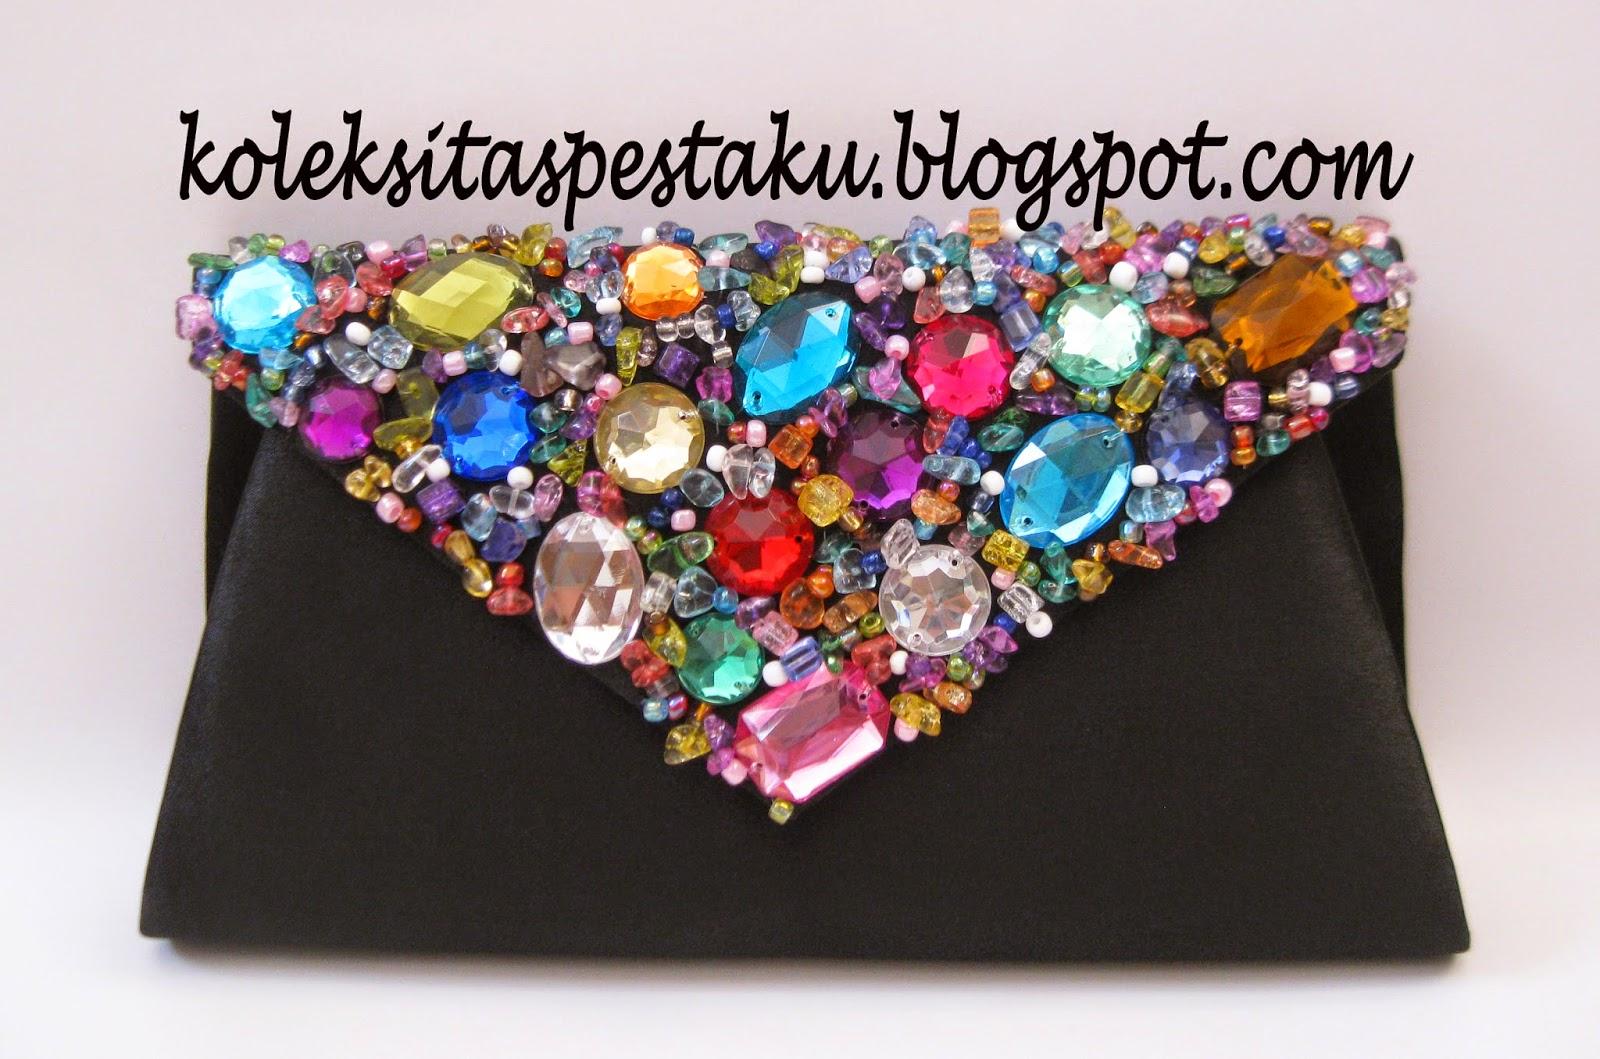 Ready Stock Terbaru dan Mewah Clutch Bag Cantik Mewah